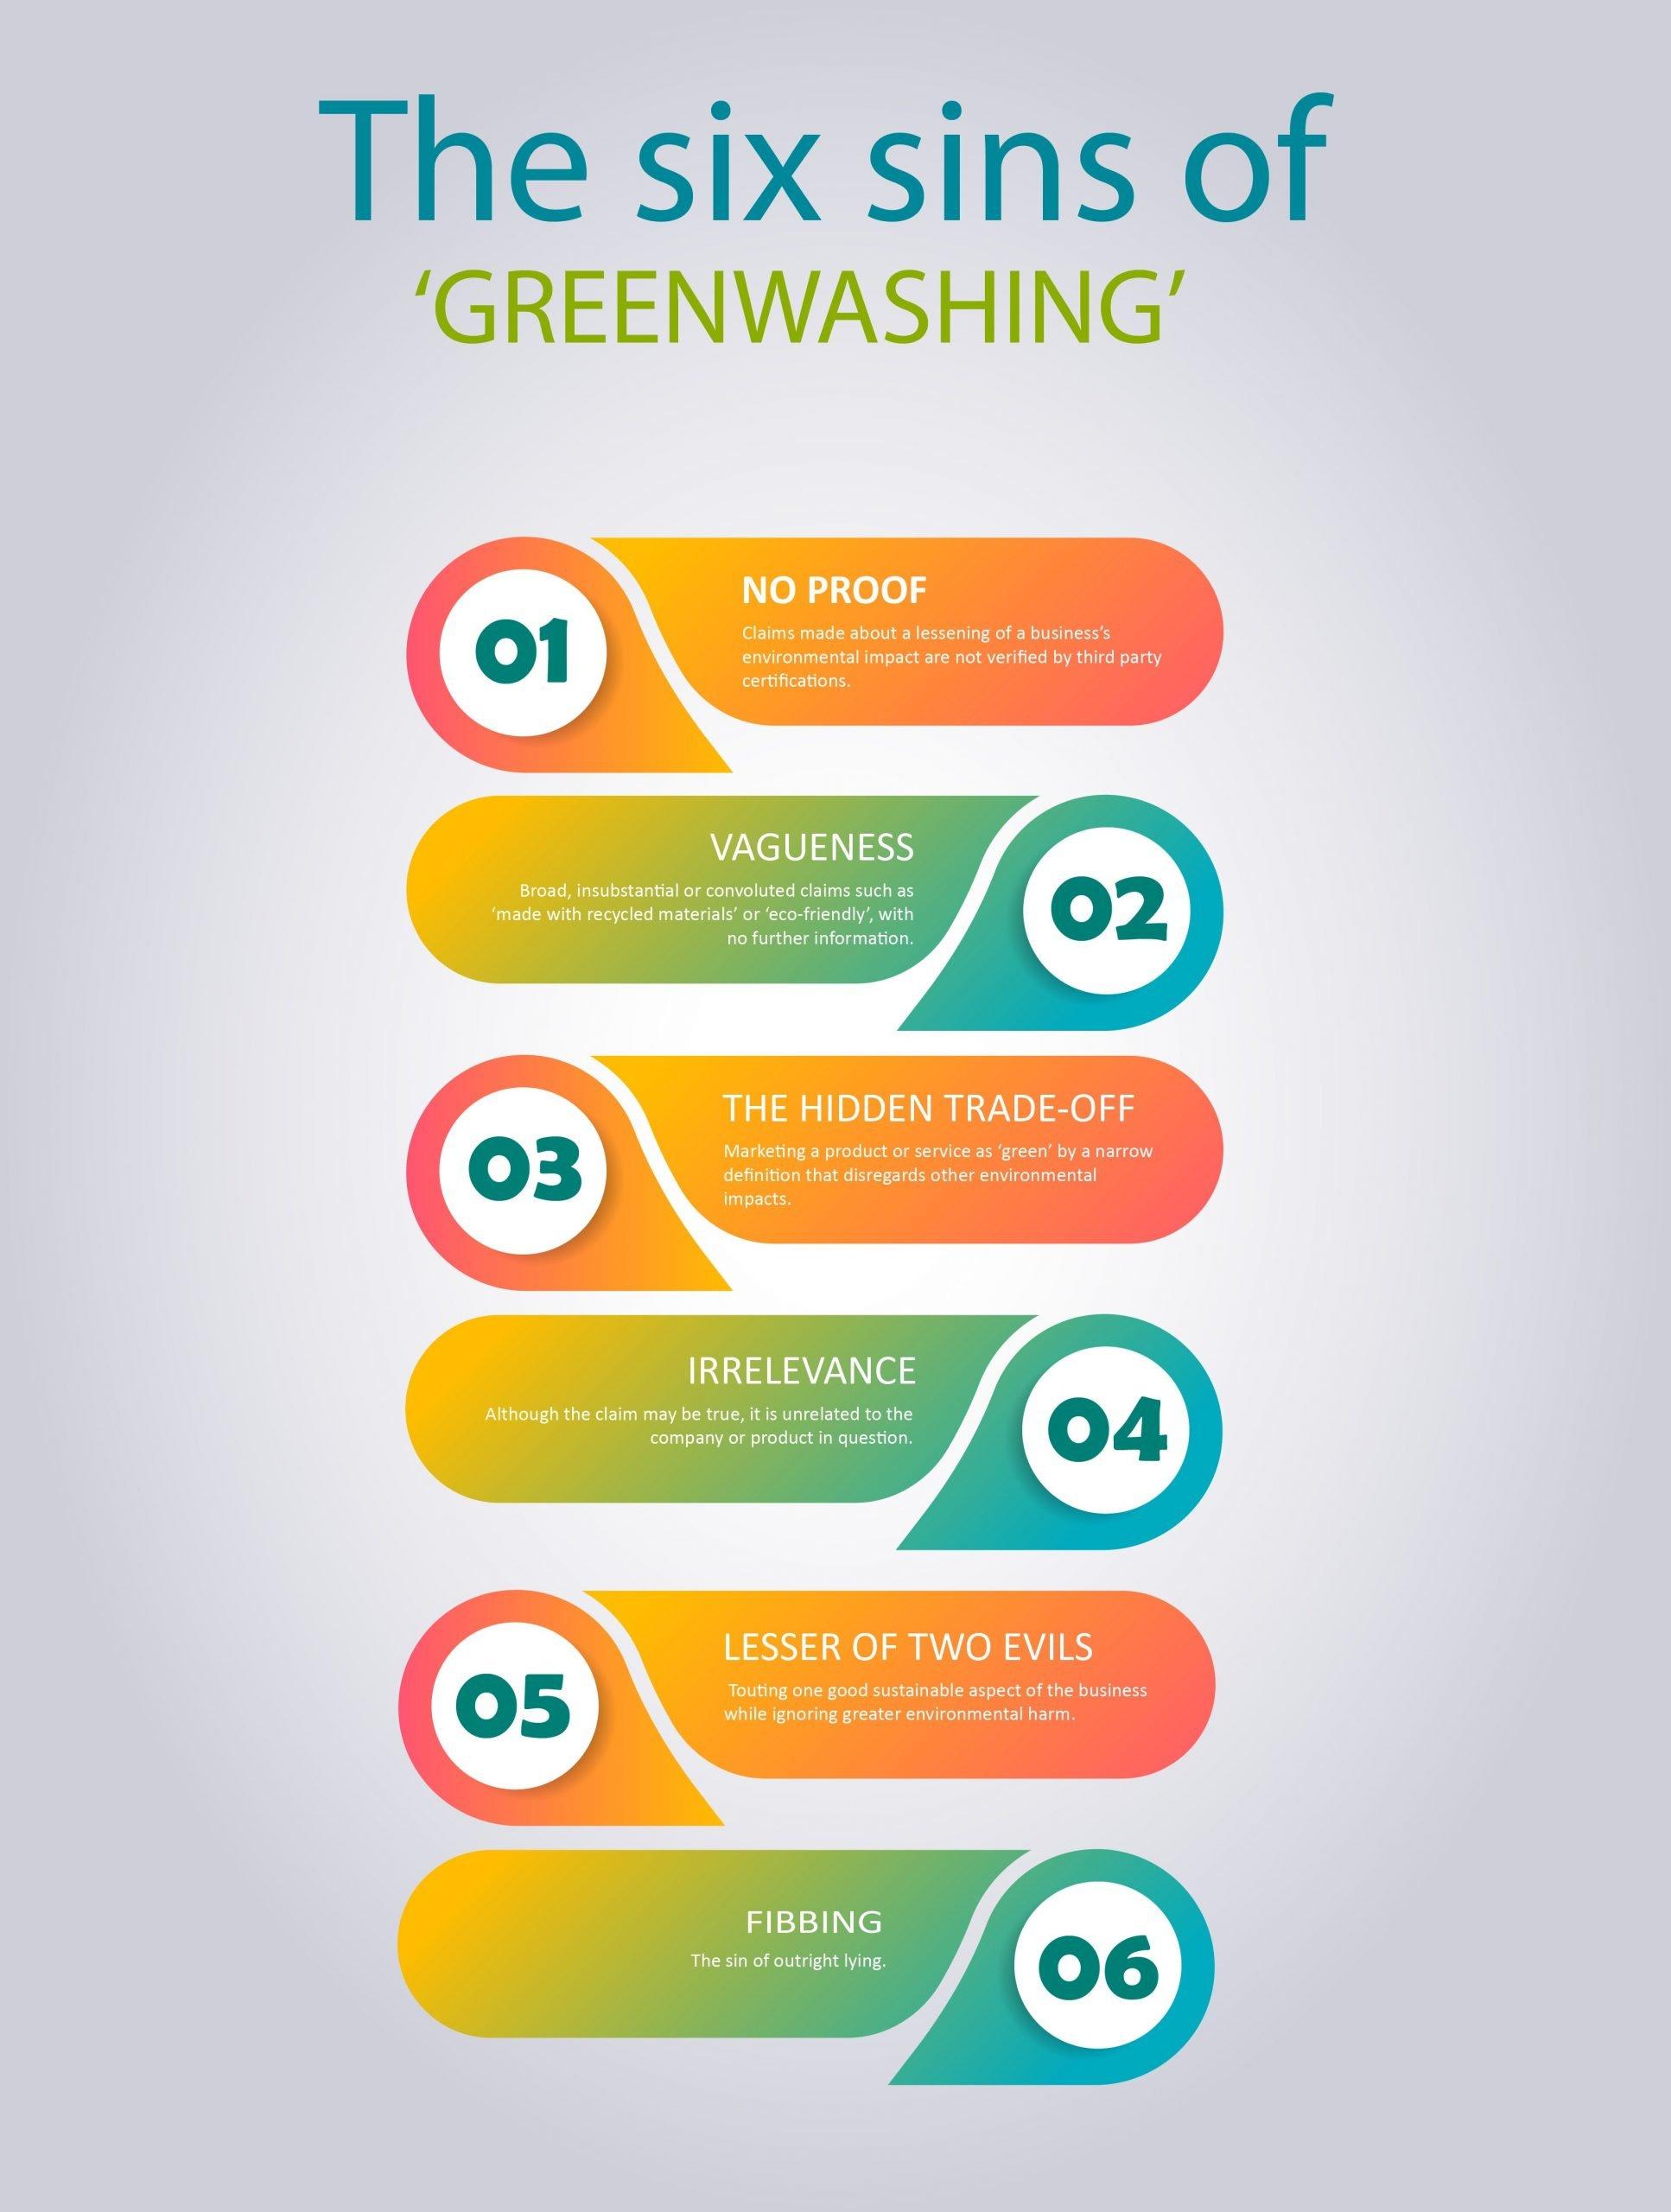 The six sins of greenwashing